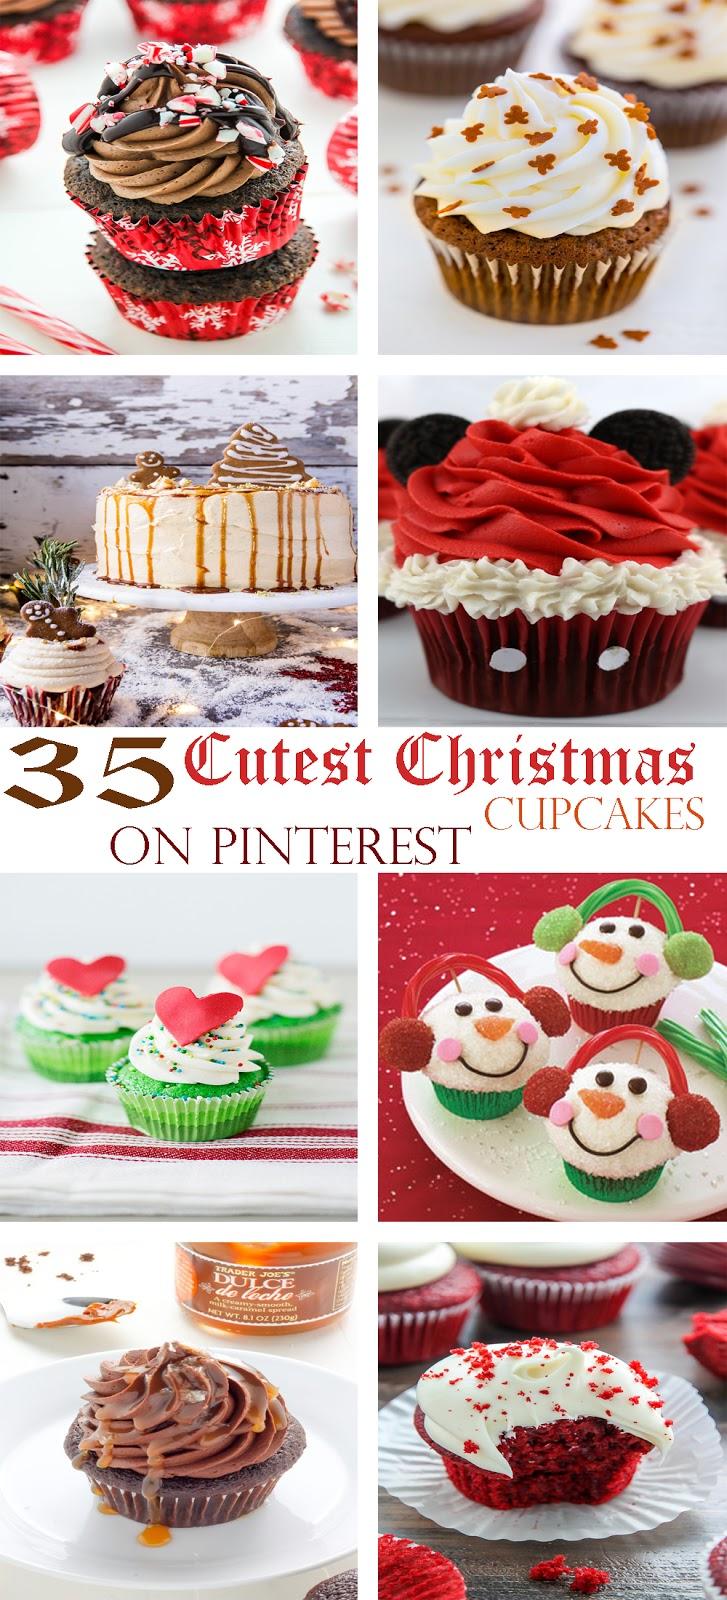 35 Cutest Christmas Cupcakes On Pinterest